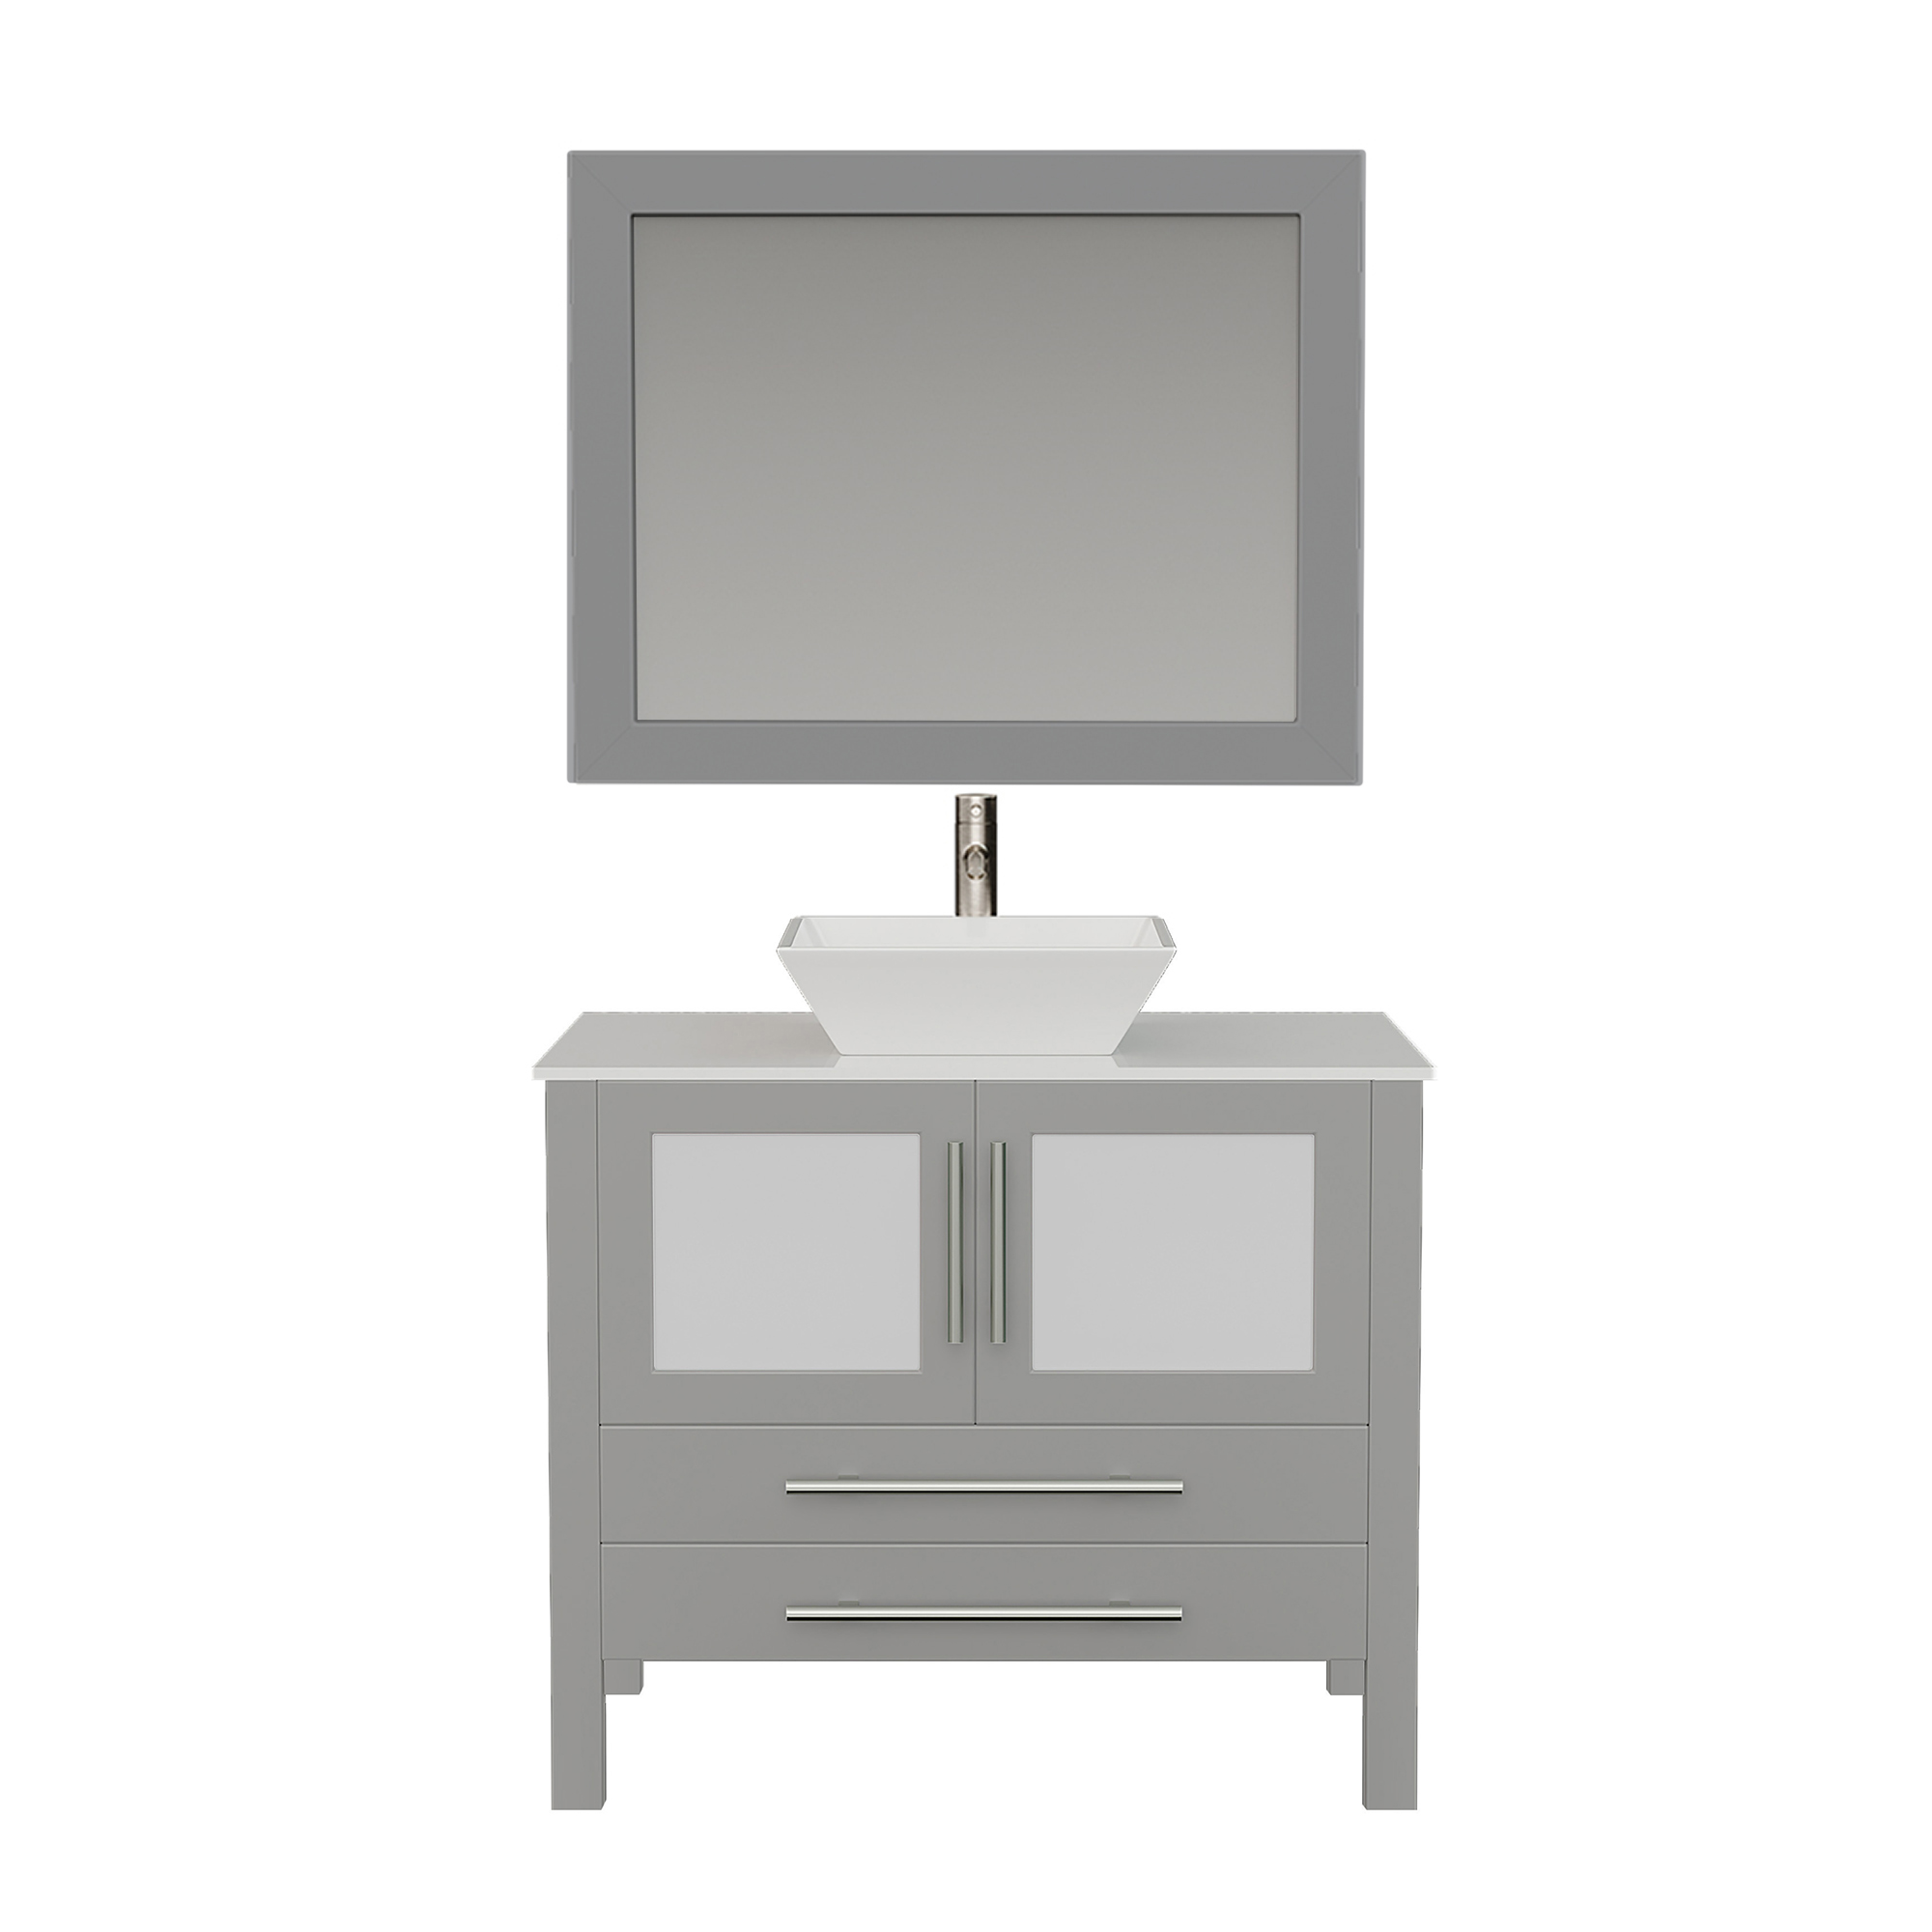 8111G Gray Vanity Set w/Brushed Nickel Faucet